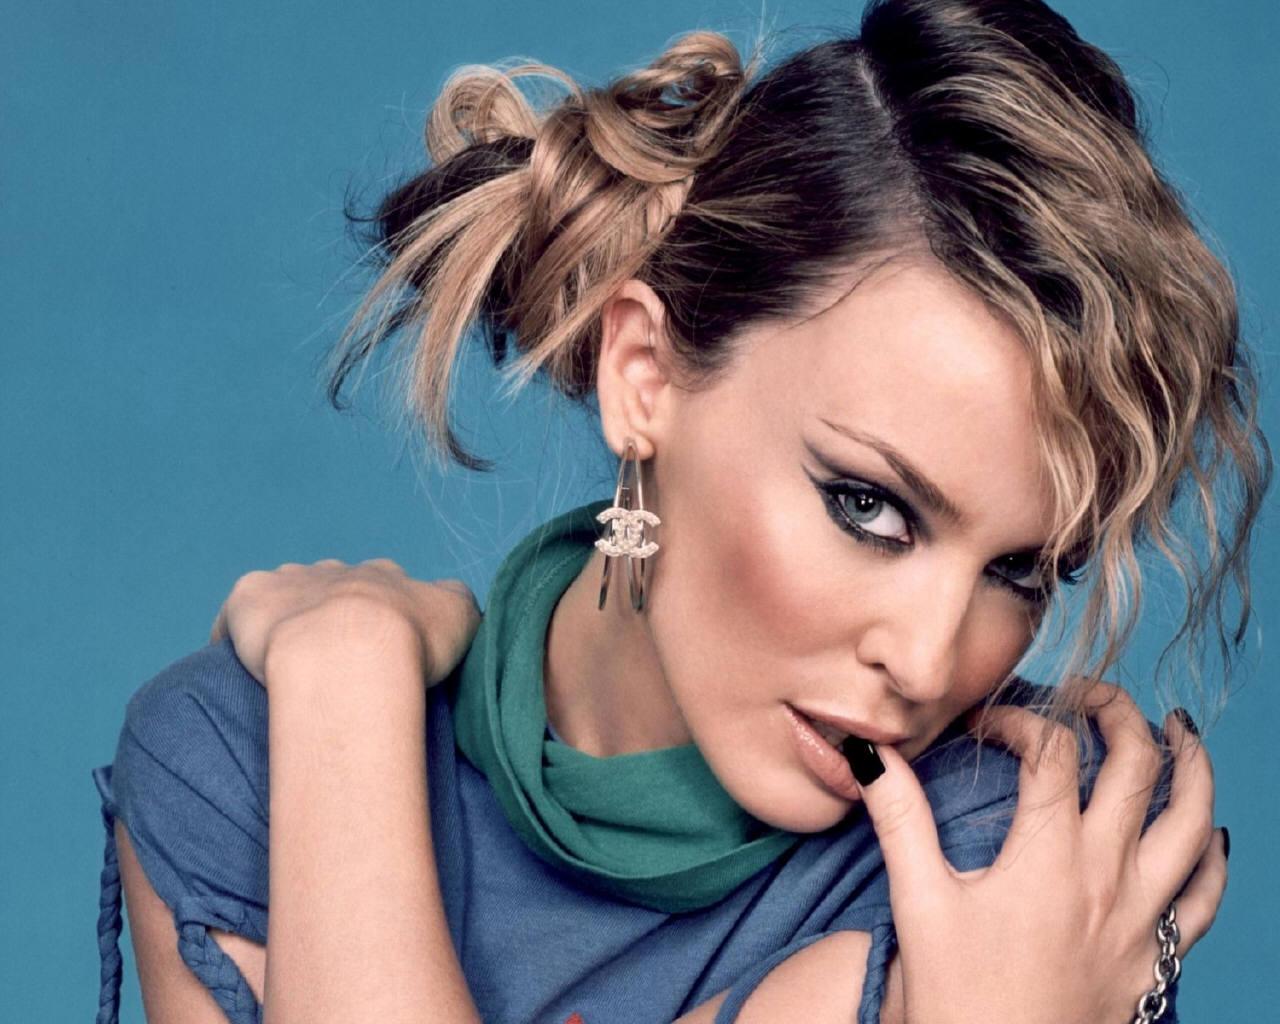 http://2.bp.blogspot.com/_2fj5XIkLoyc/TFwIwvUFxmI/AAAAAAAAAwE/uDZ70uNamnU/s1600/Kylie-Minogue-kylie-minogue-64557_1280_1024.jpg